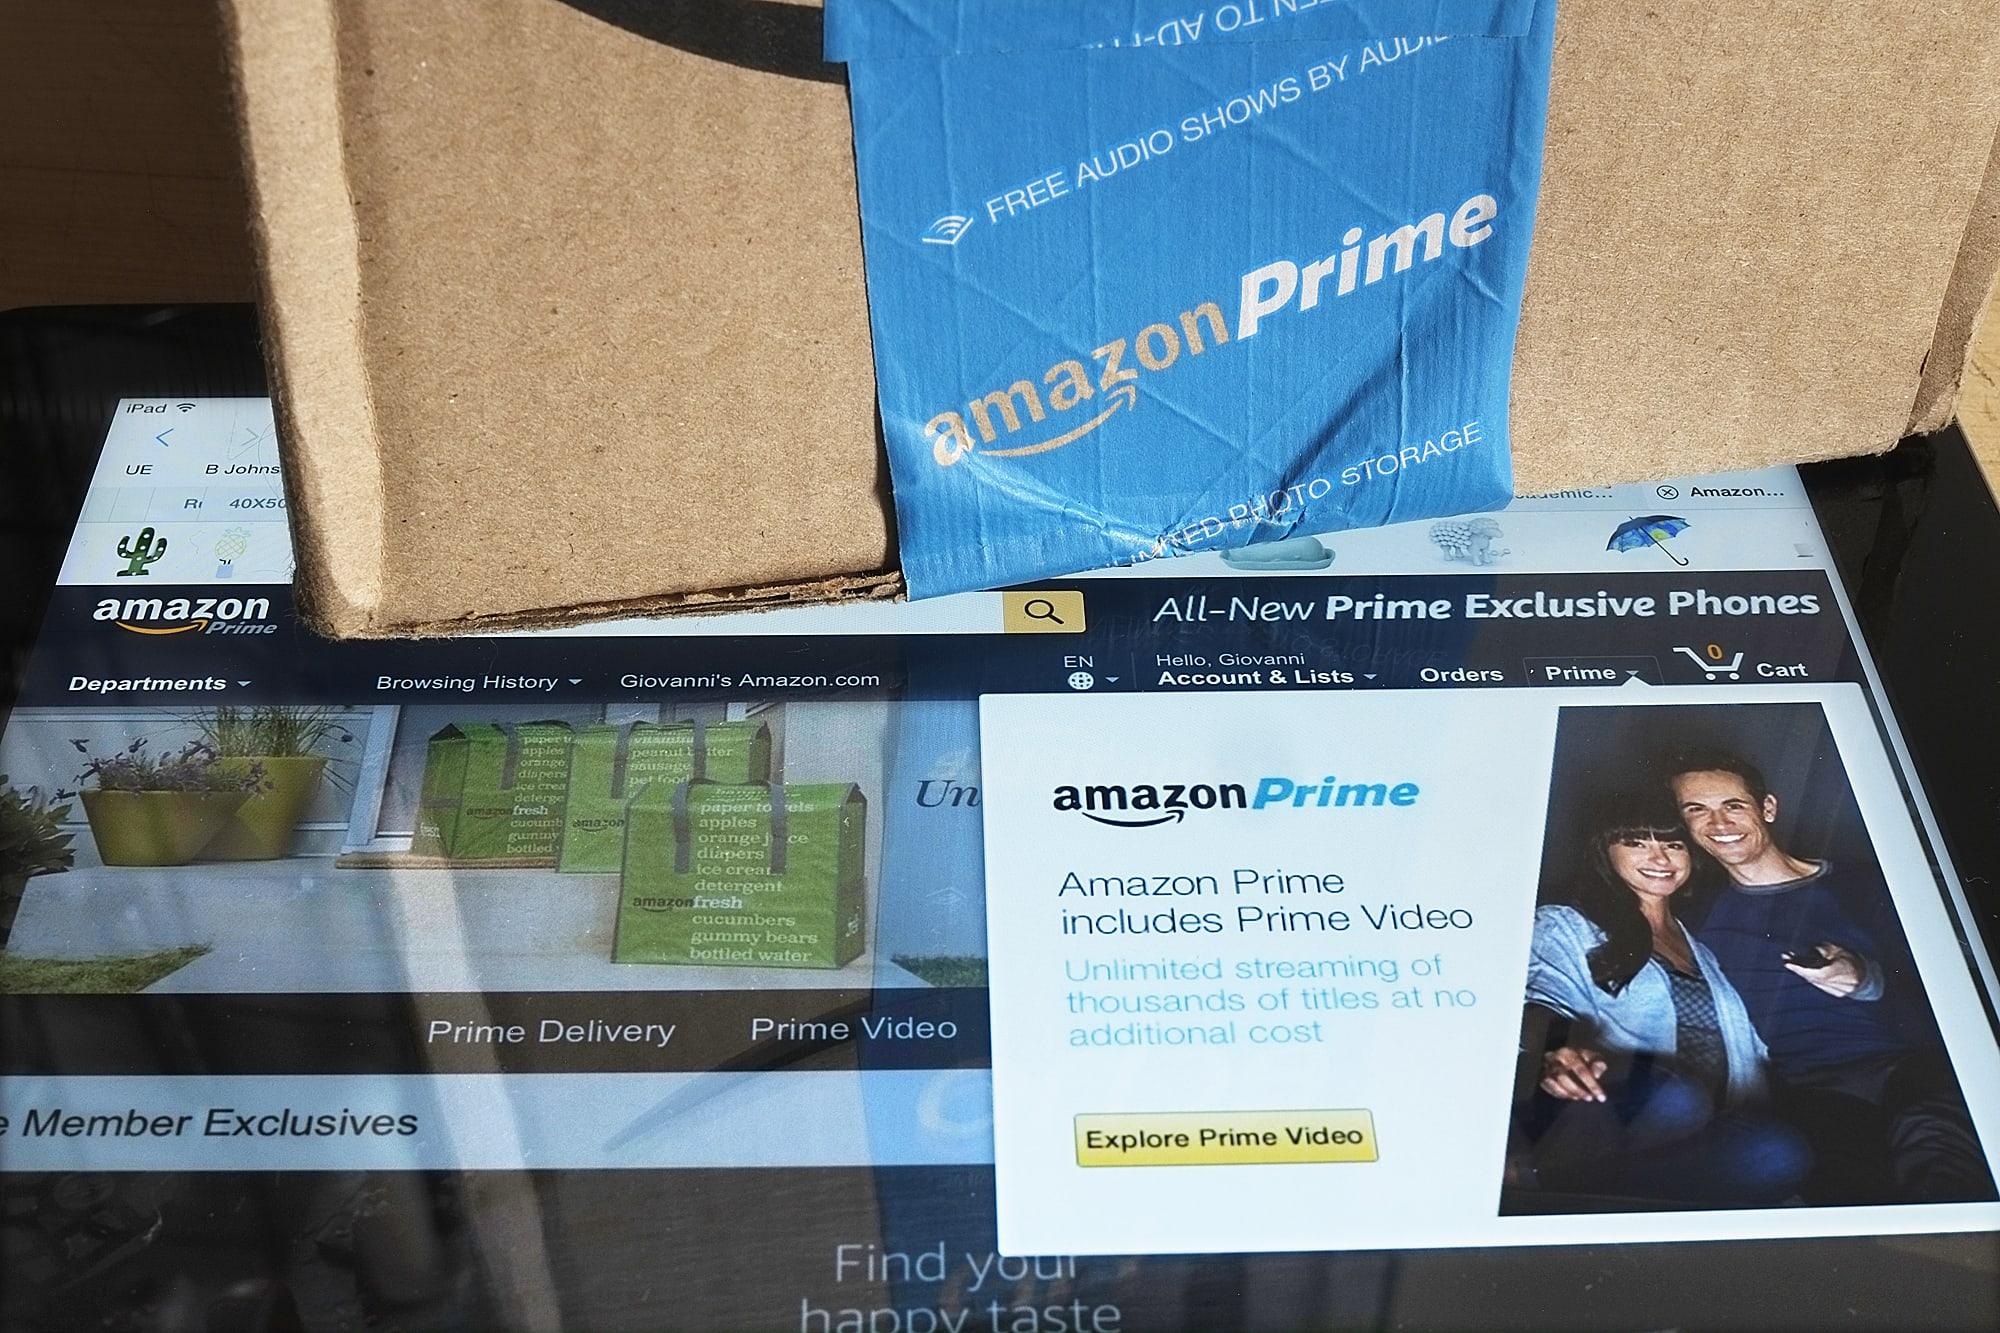 Amazon Prime on iPad